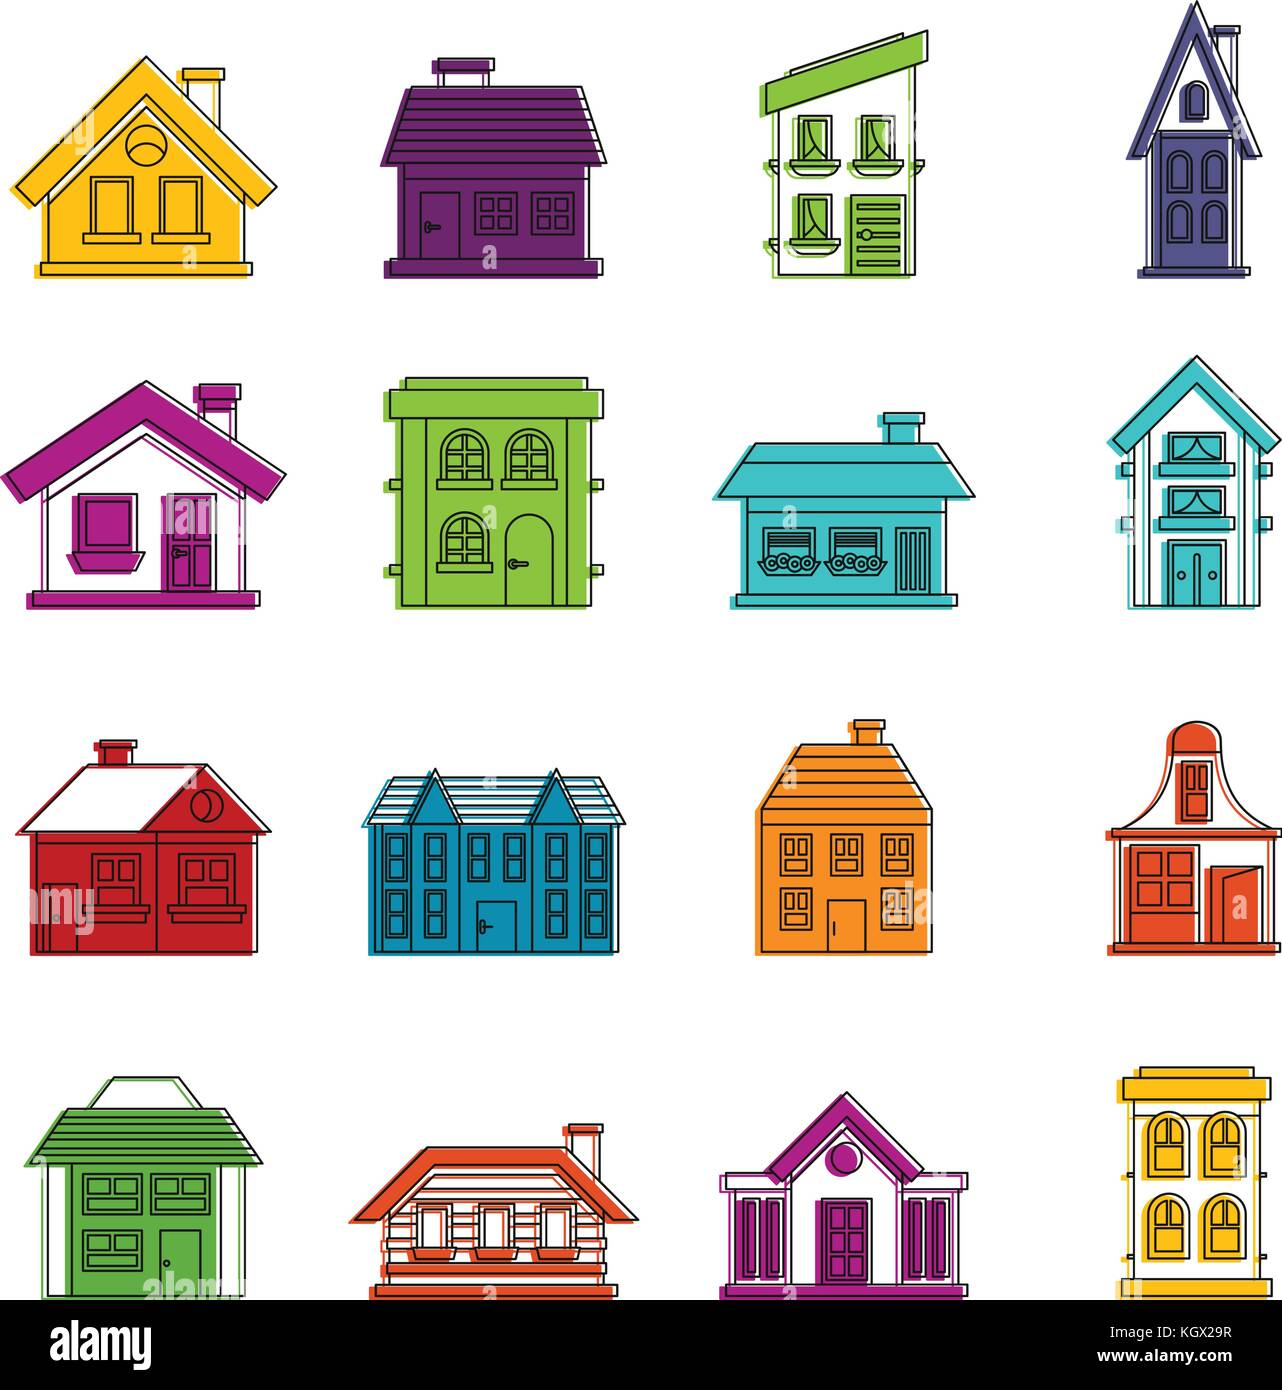 House icons doodle set - Stock Image